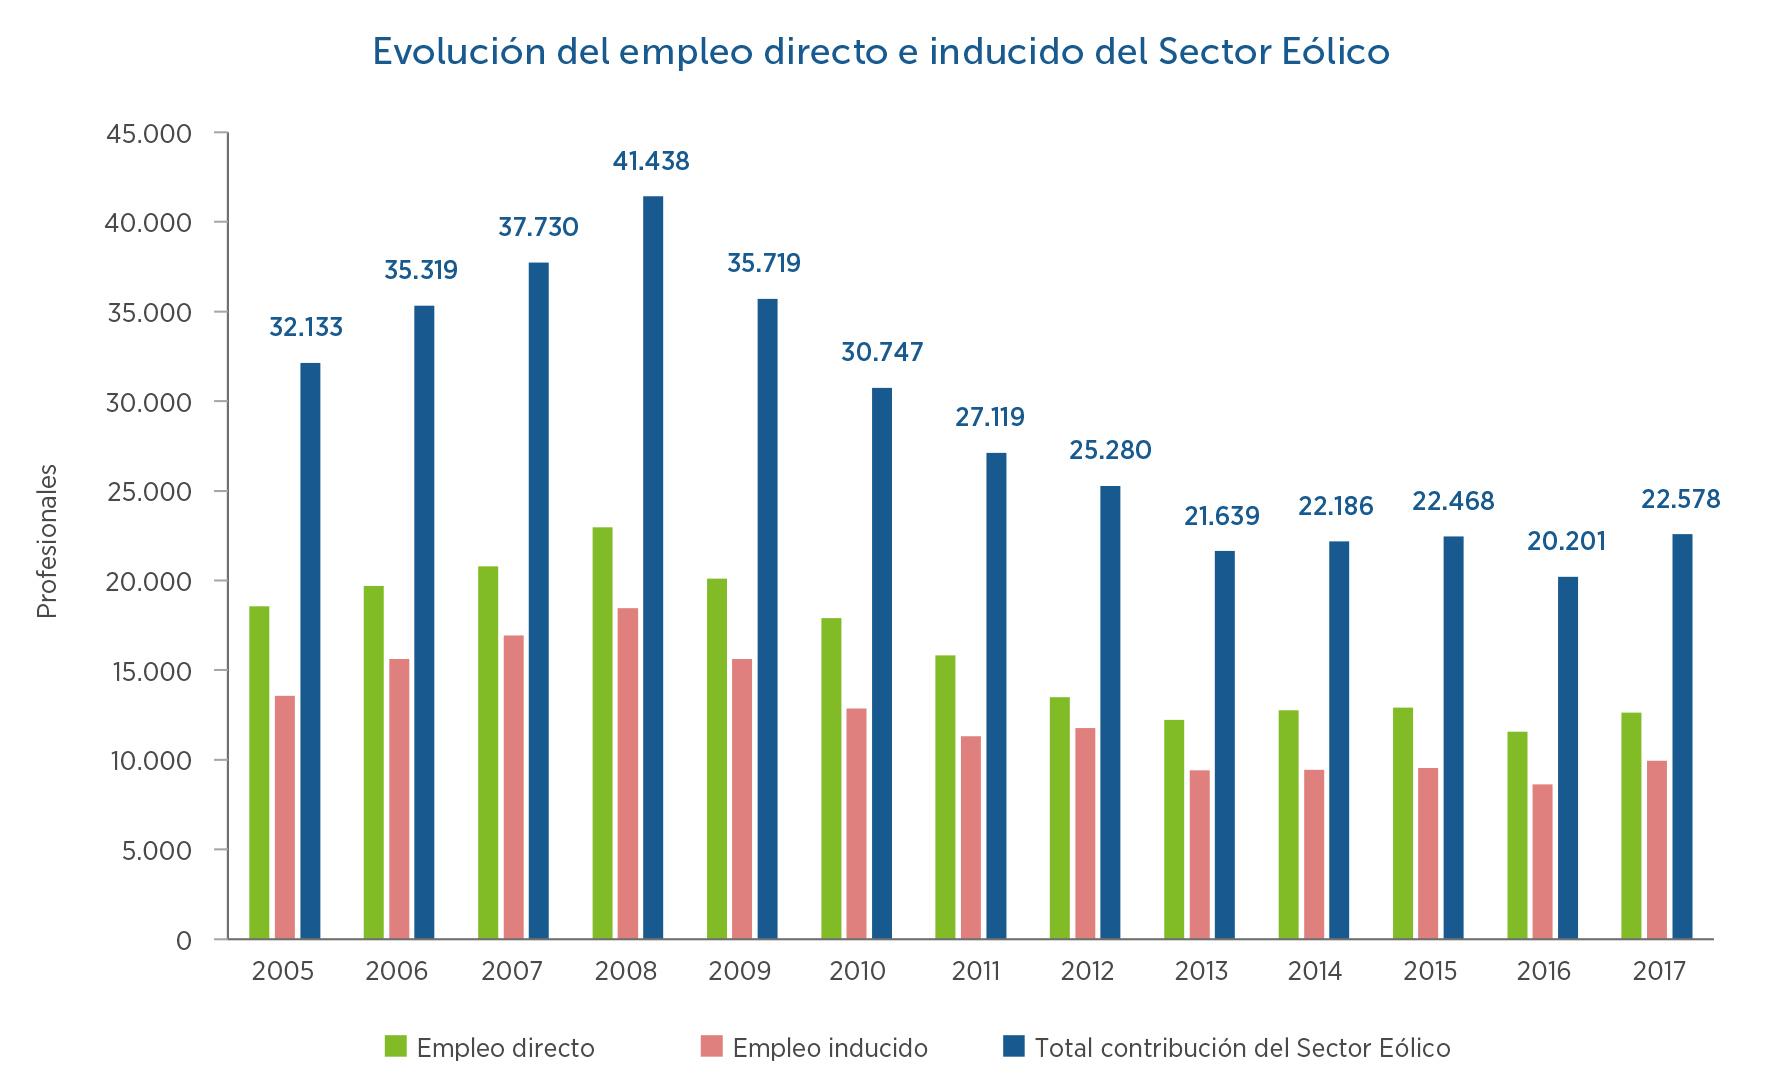 11-Evolucion-empleo-sector-eolico